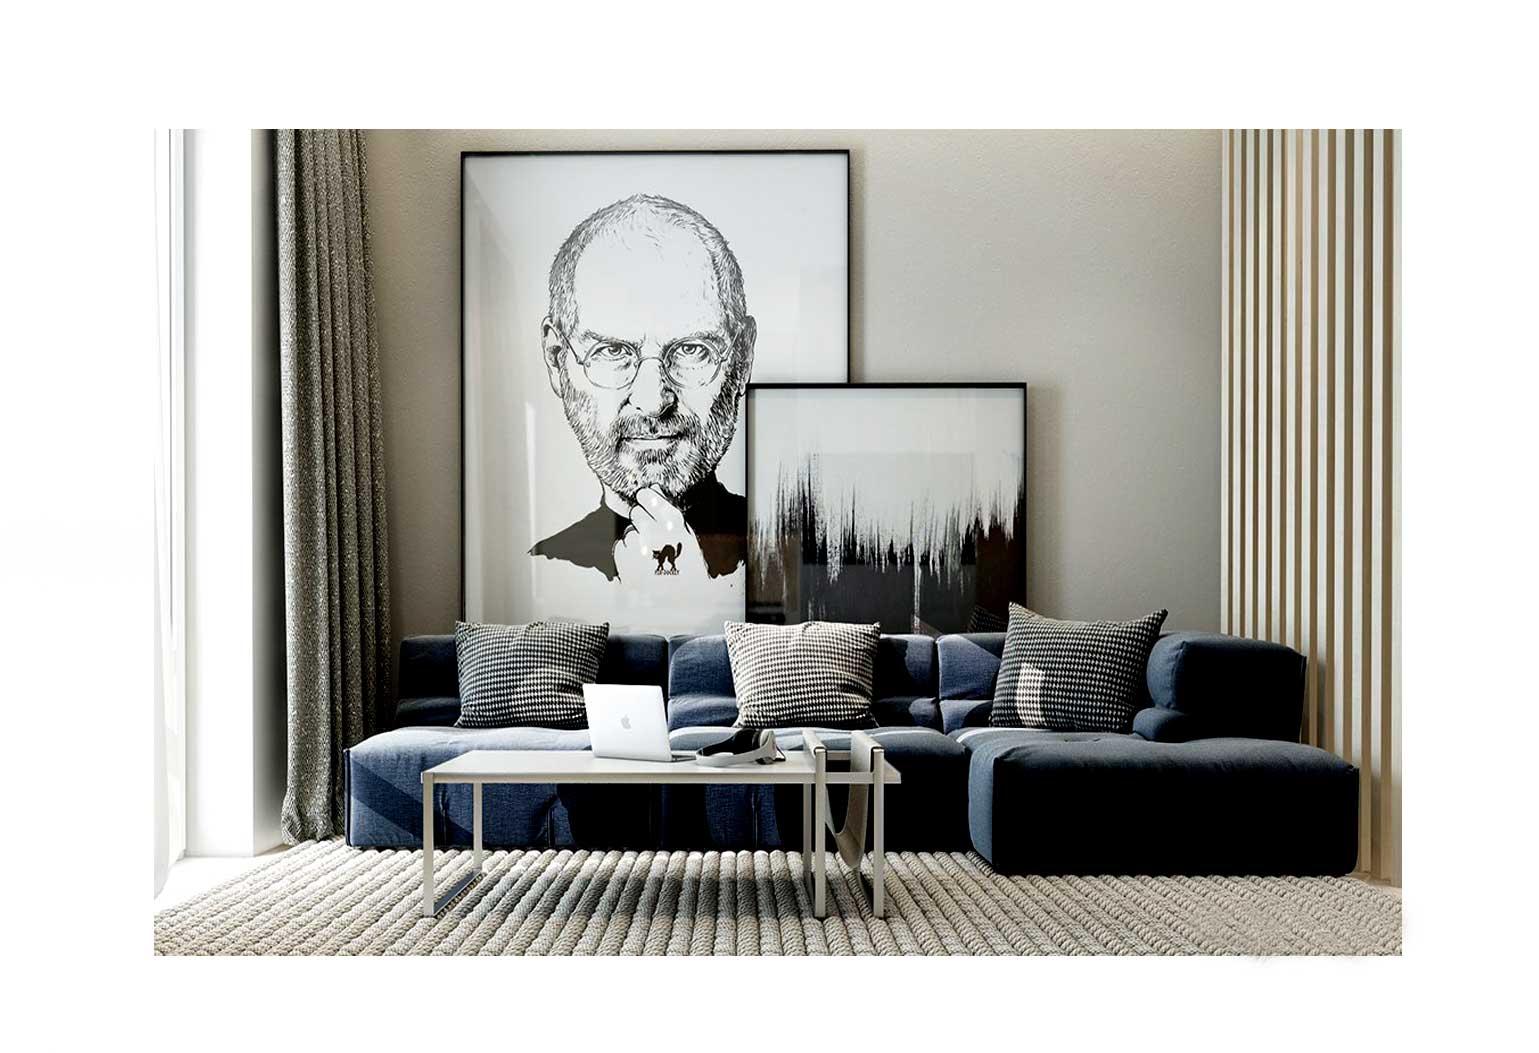 Design An Art centric Room099 - چگونه یک اتاق هنری را طراحی کنیم؟